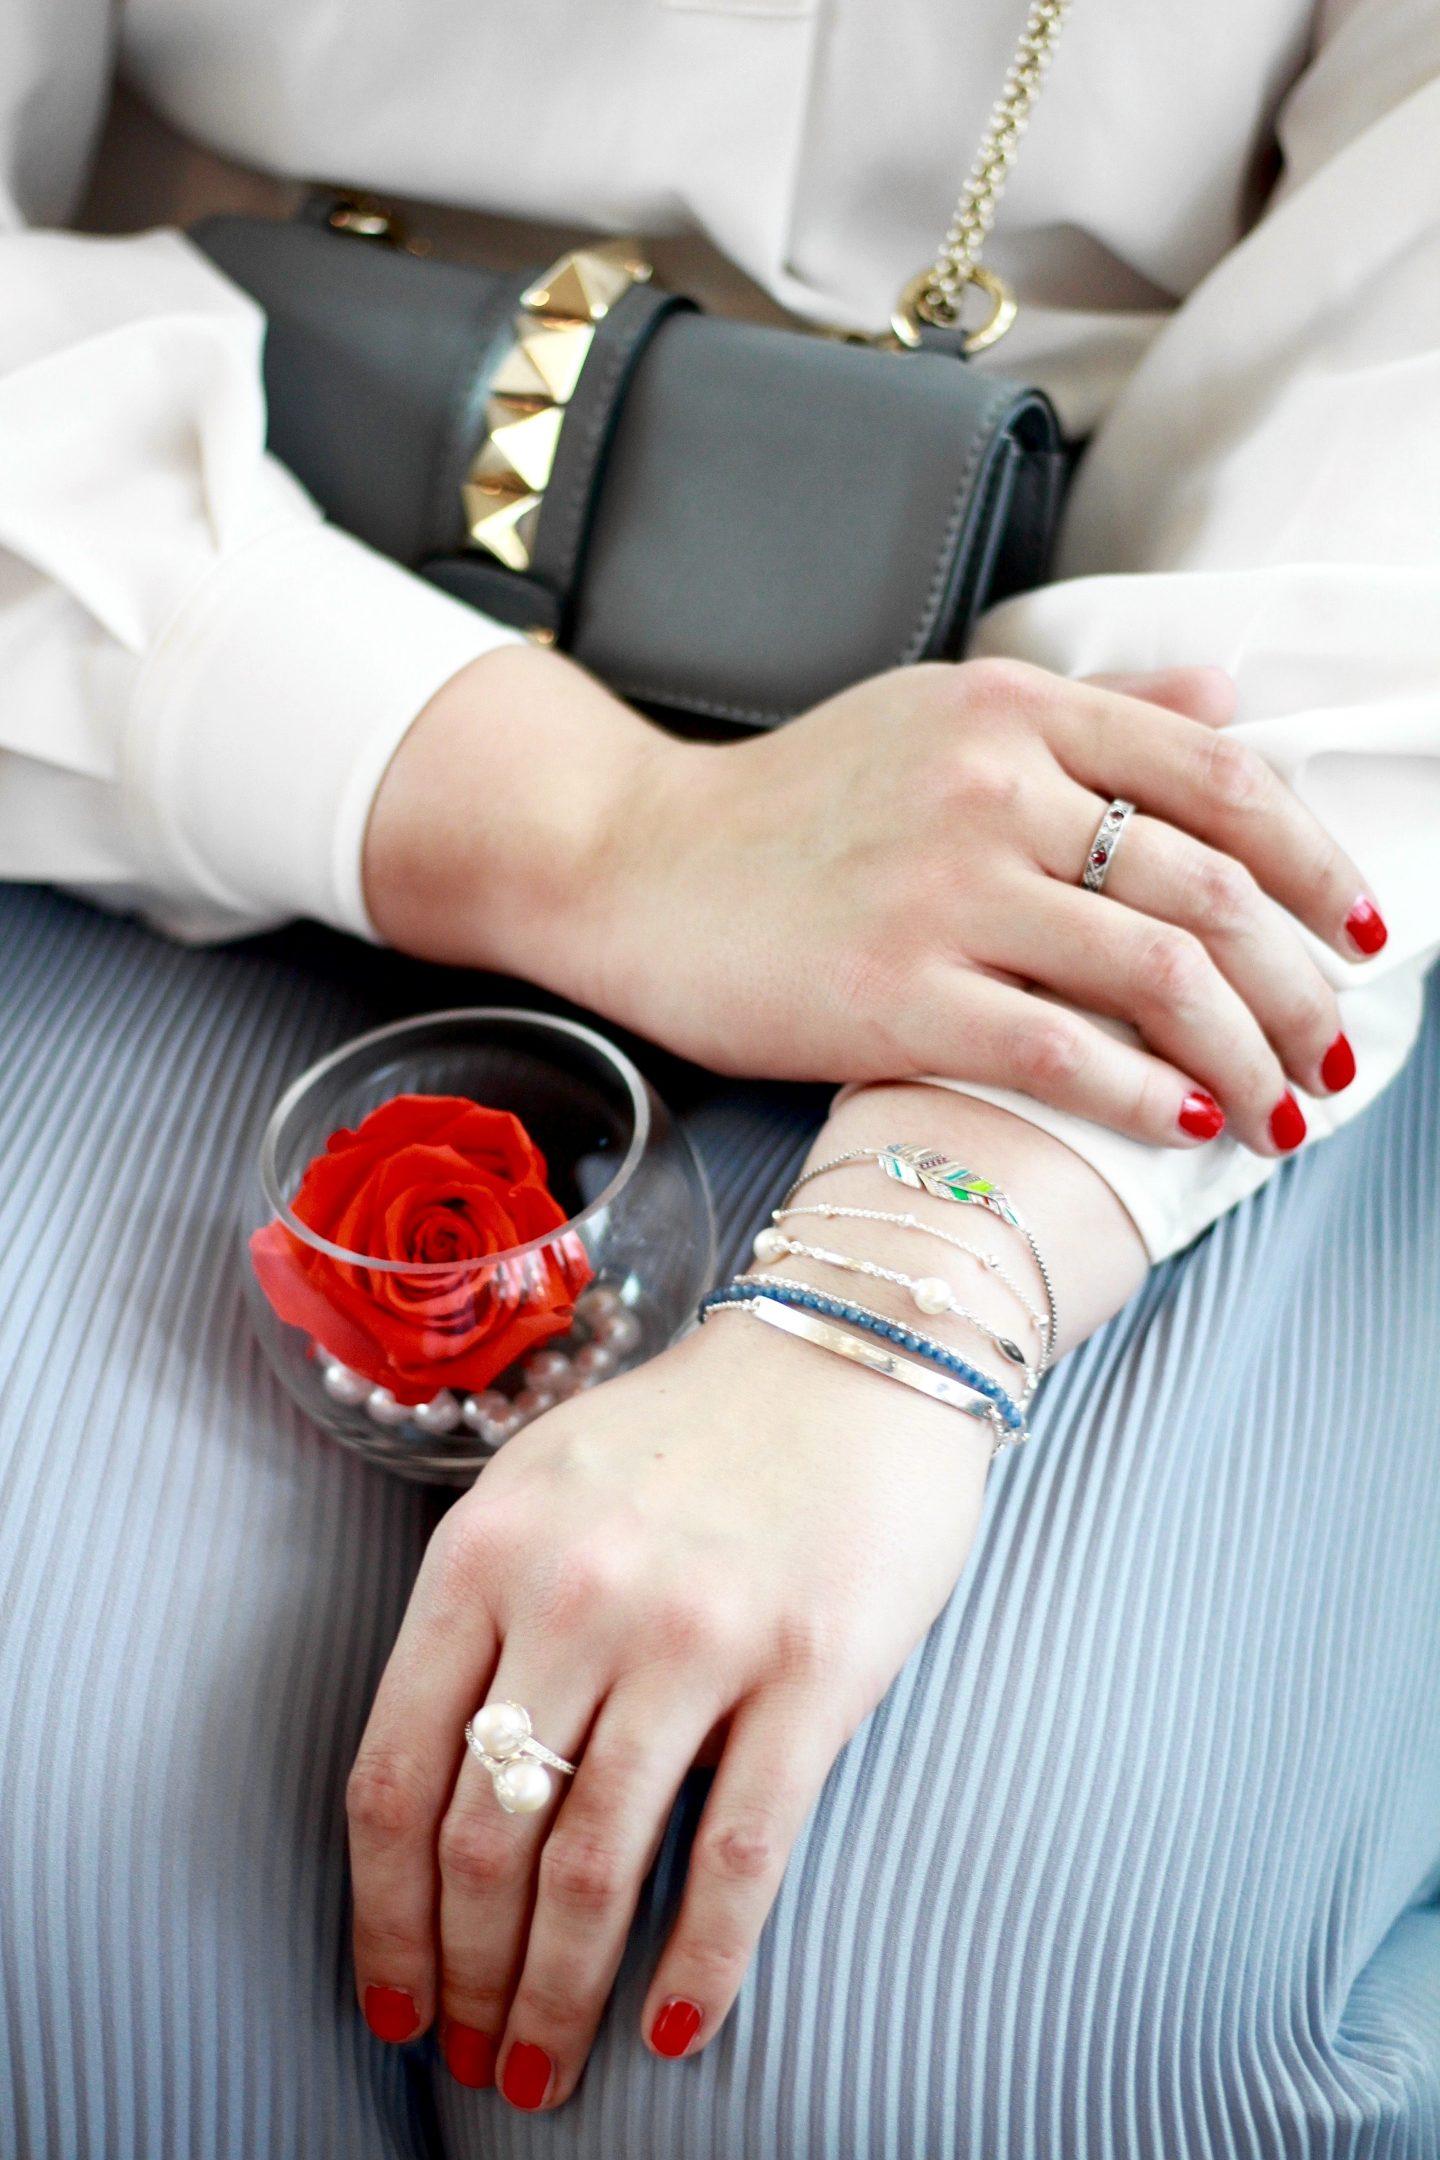 schmuckliebe-lieblingsstücke-lieblingsschmuck-armbänder-ringe-perlenarmband-valentino-glam-lock-susanne-heidebach-miss-suzie-loves-plisseehose-zara-thomas-sabo-fashionblogger-munichblogger-münchenblogger-rose-perlenring-geschenkidee-blogger-roter-nagellack